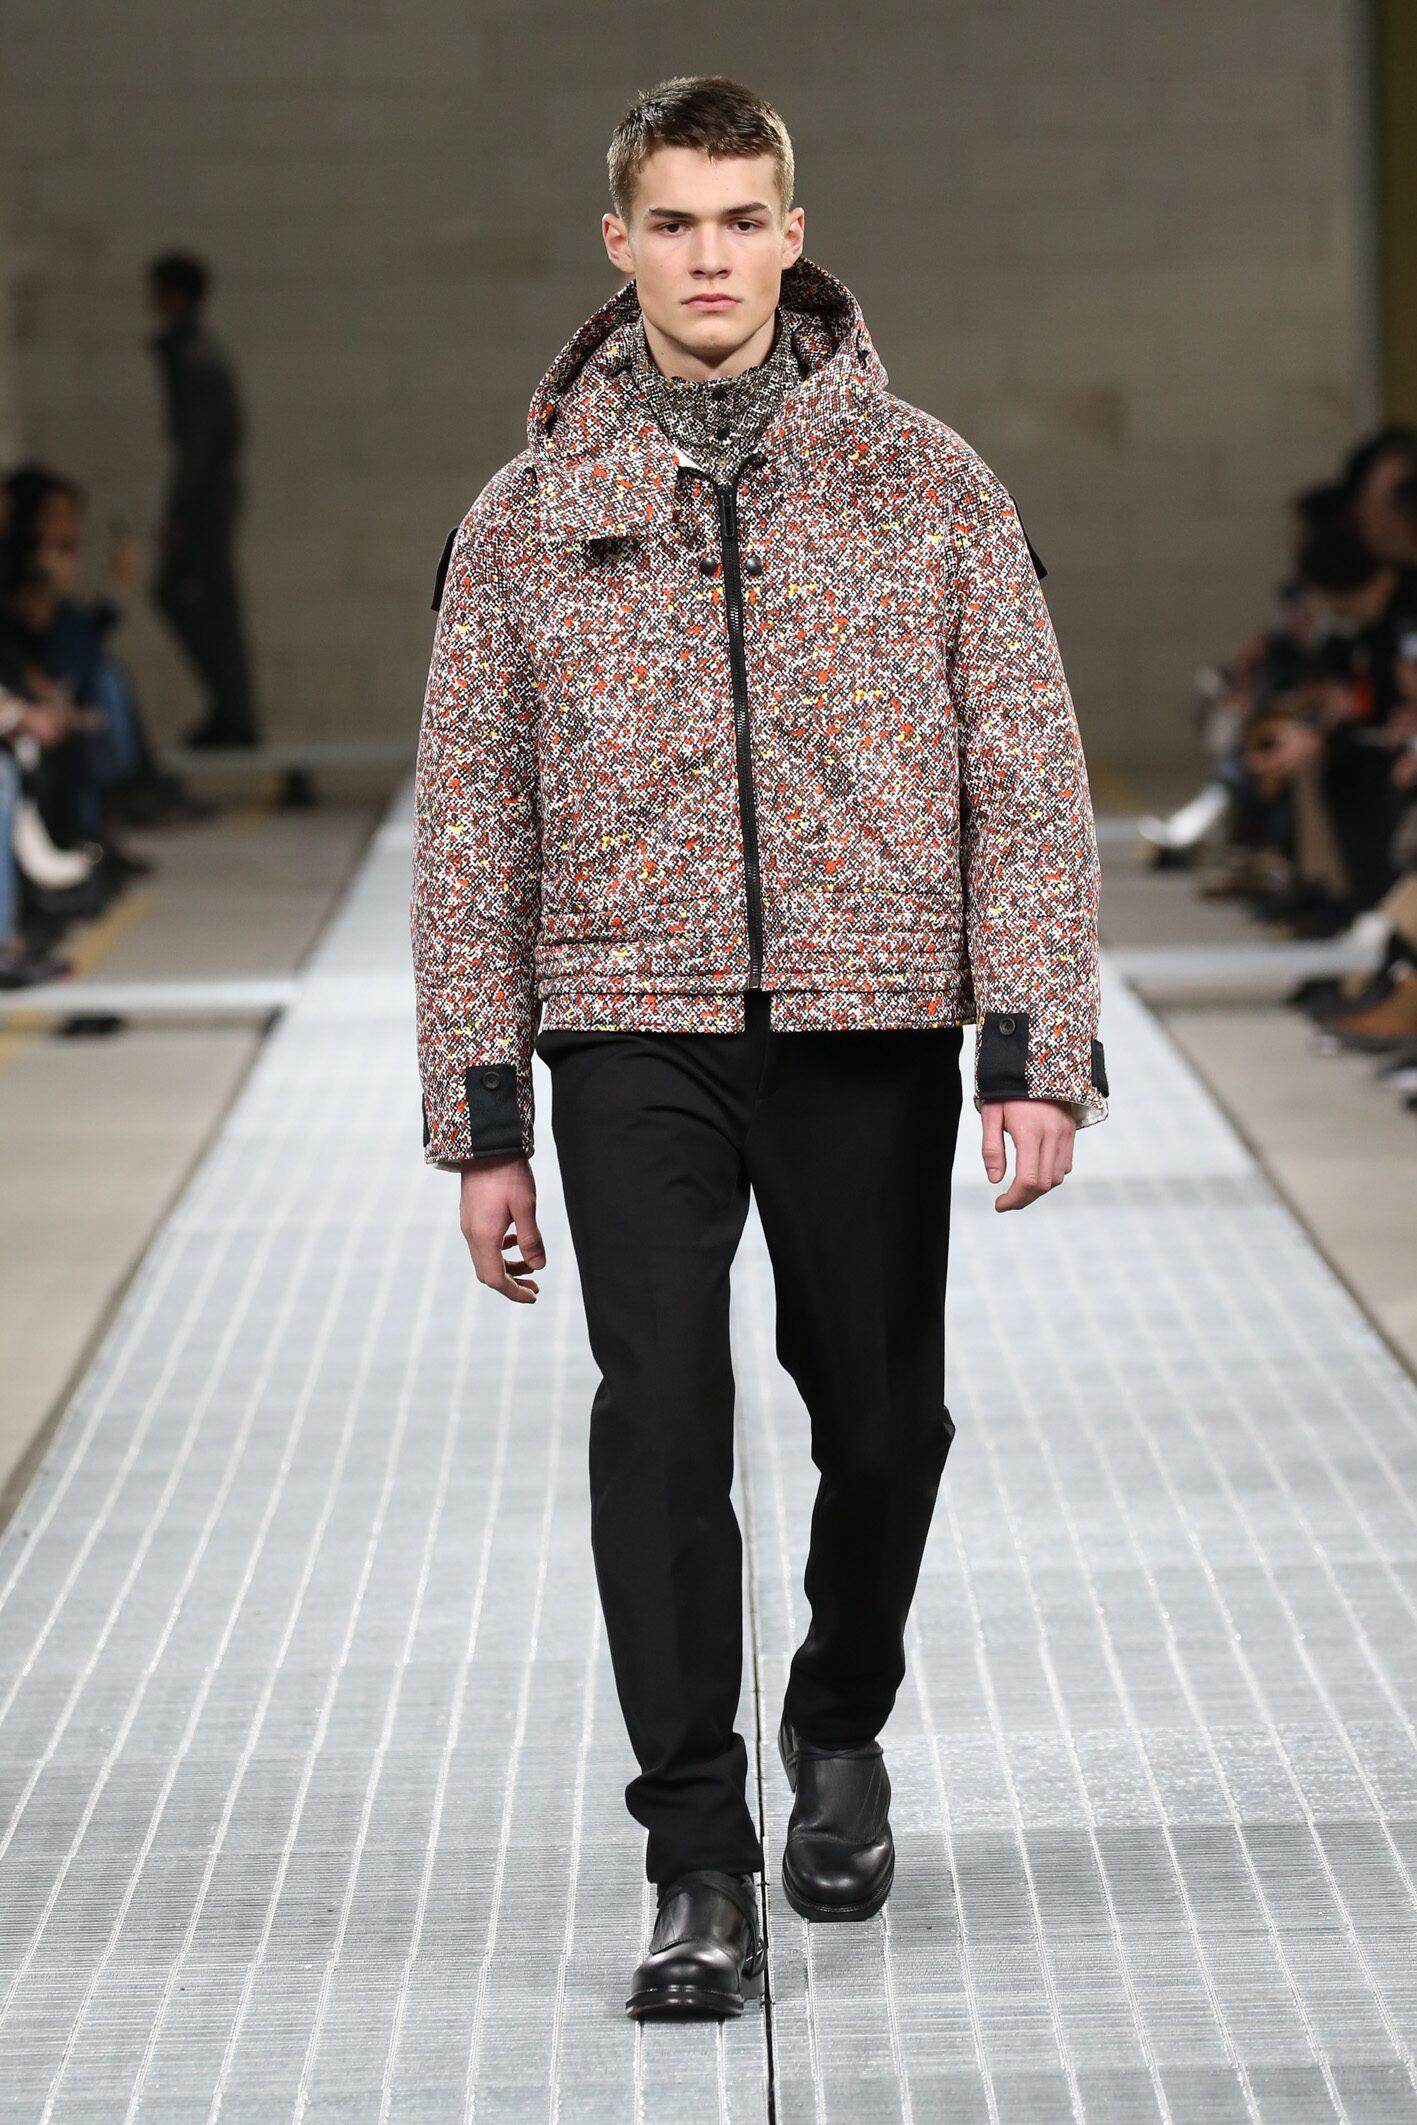 Dirk Bikkembergs Man Style